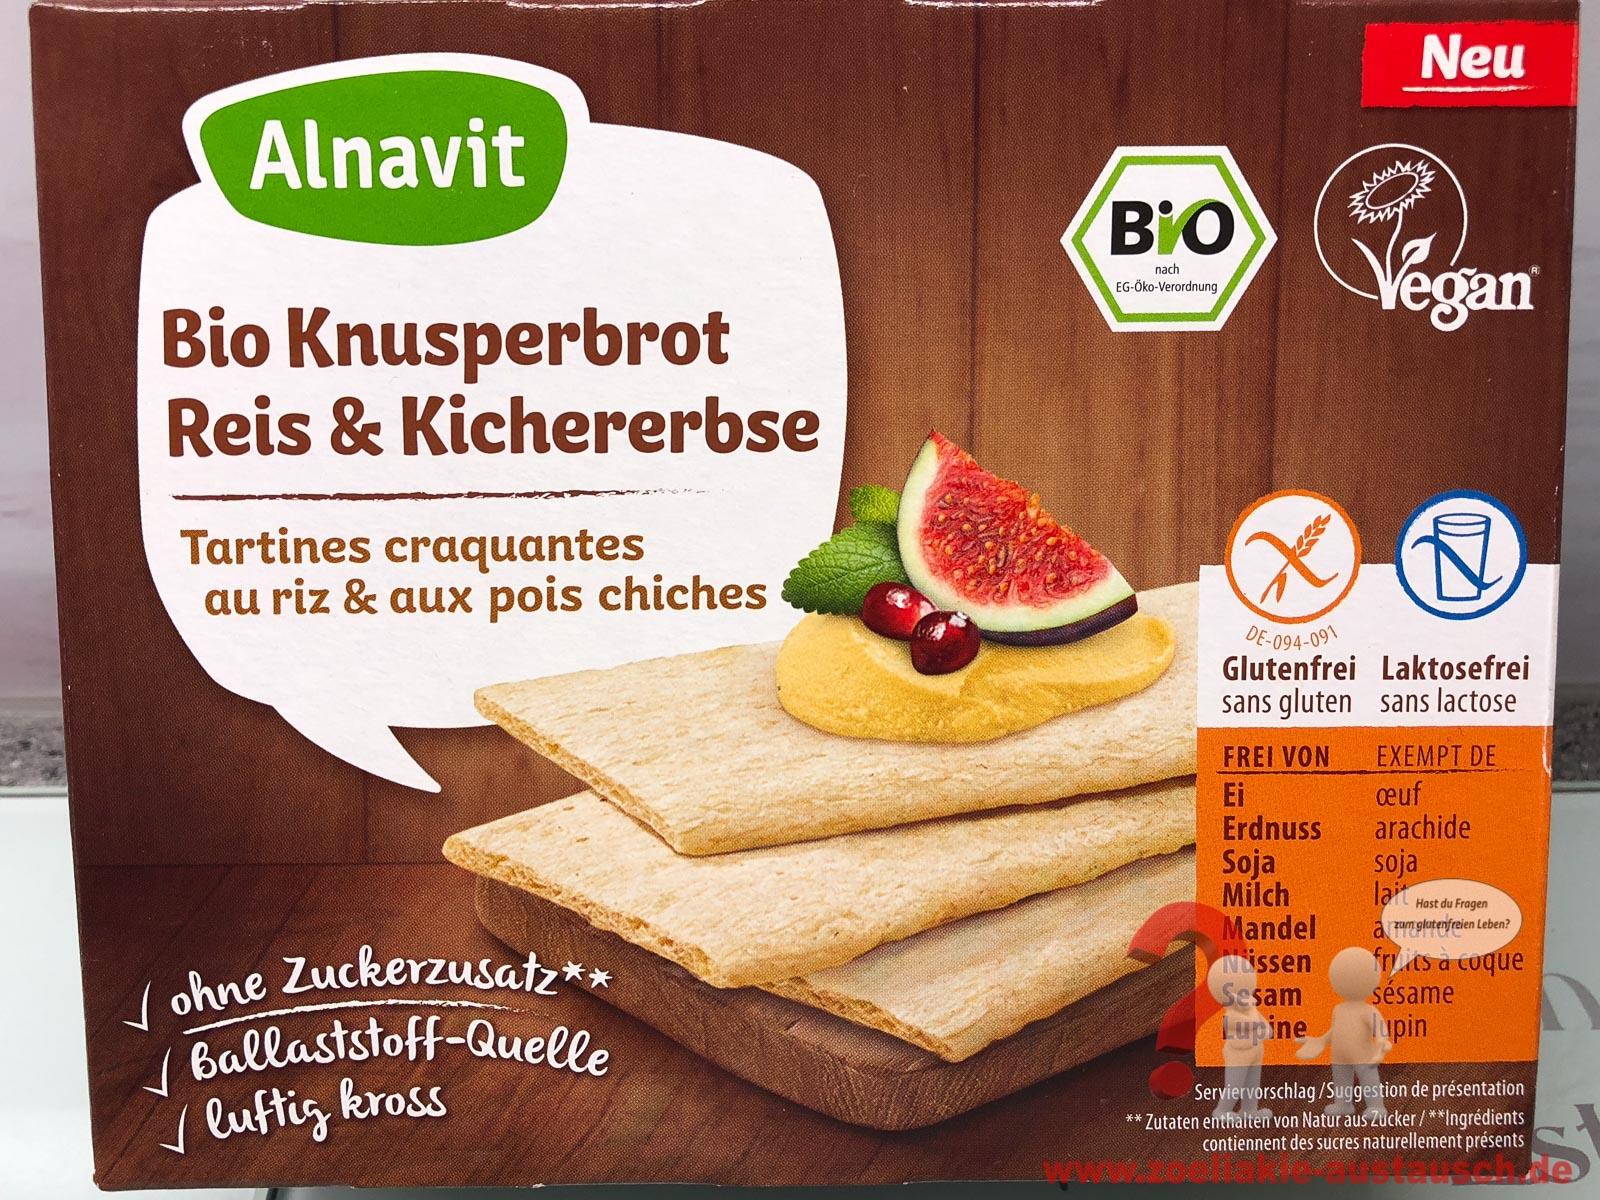 Alnavit-Zoeliakie_Austausch-011